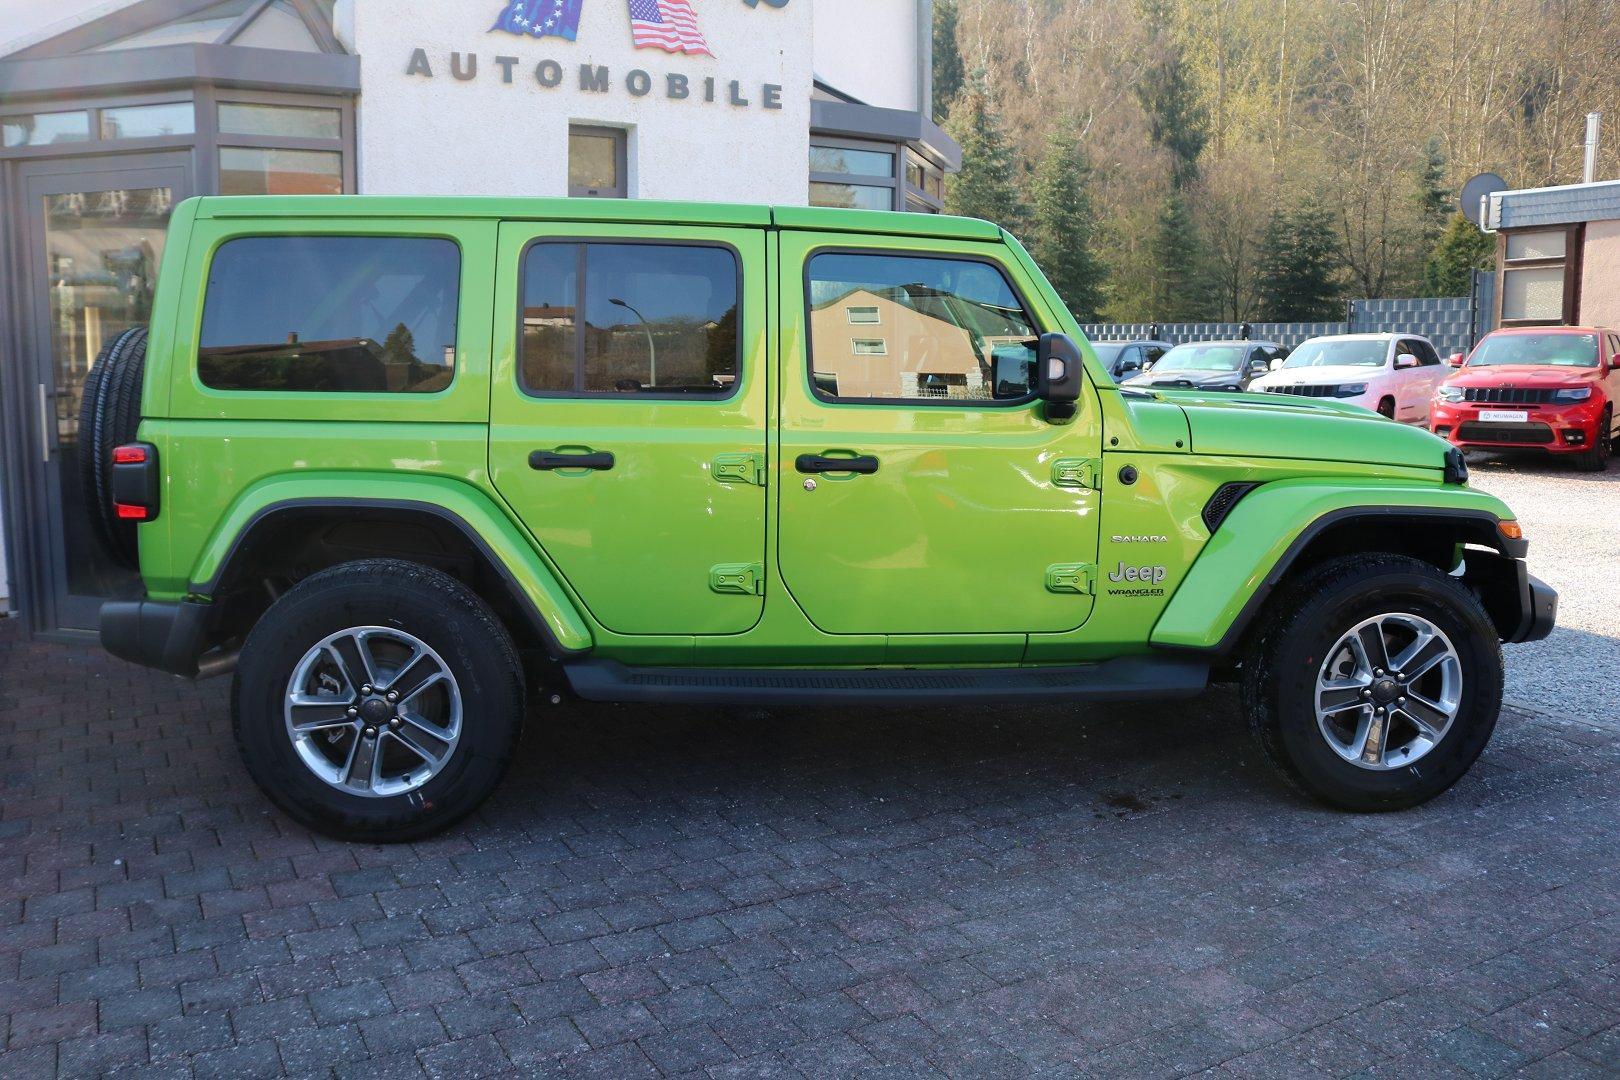 Jeep Wrangler Unlimited Jl Eu Sahara 2 0l T Gdi Hard Top Leder